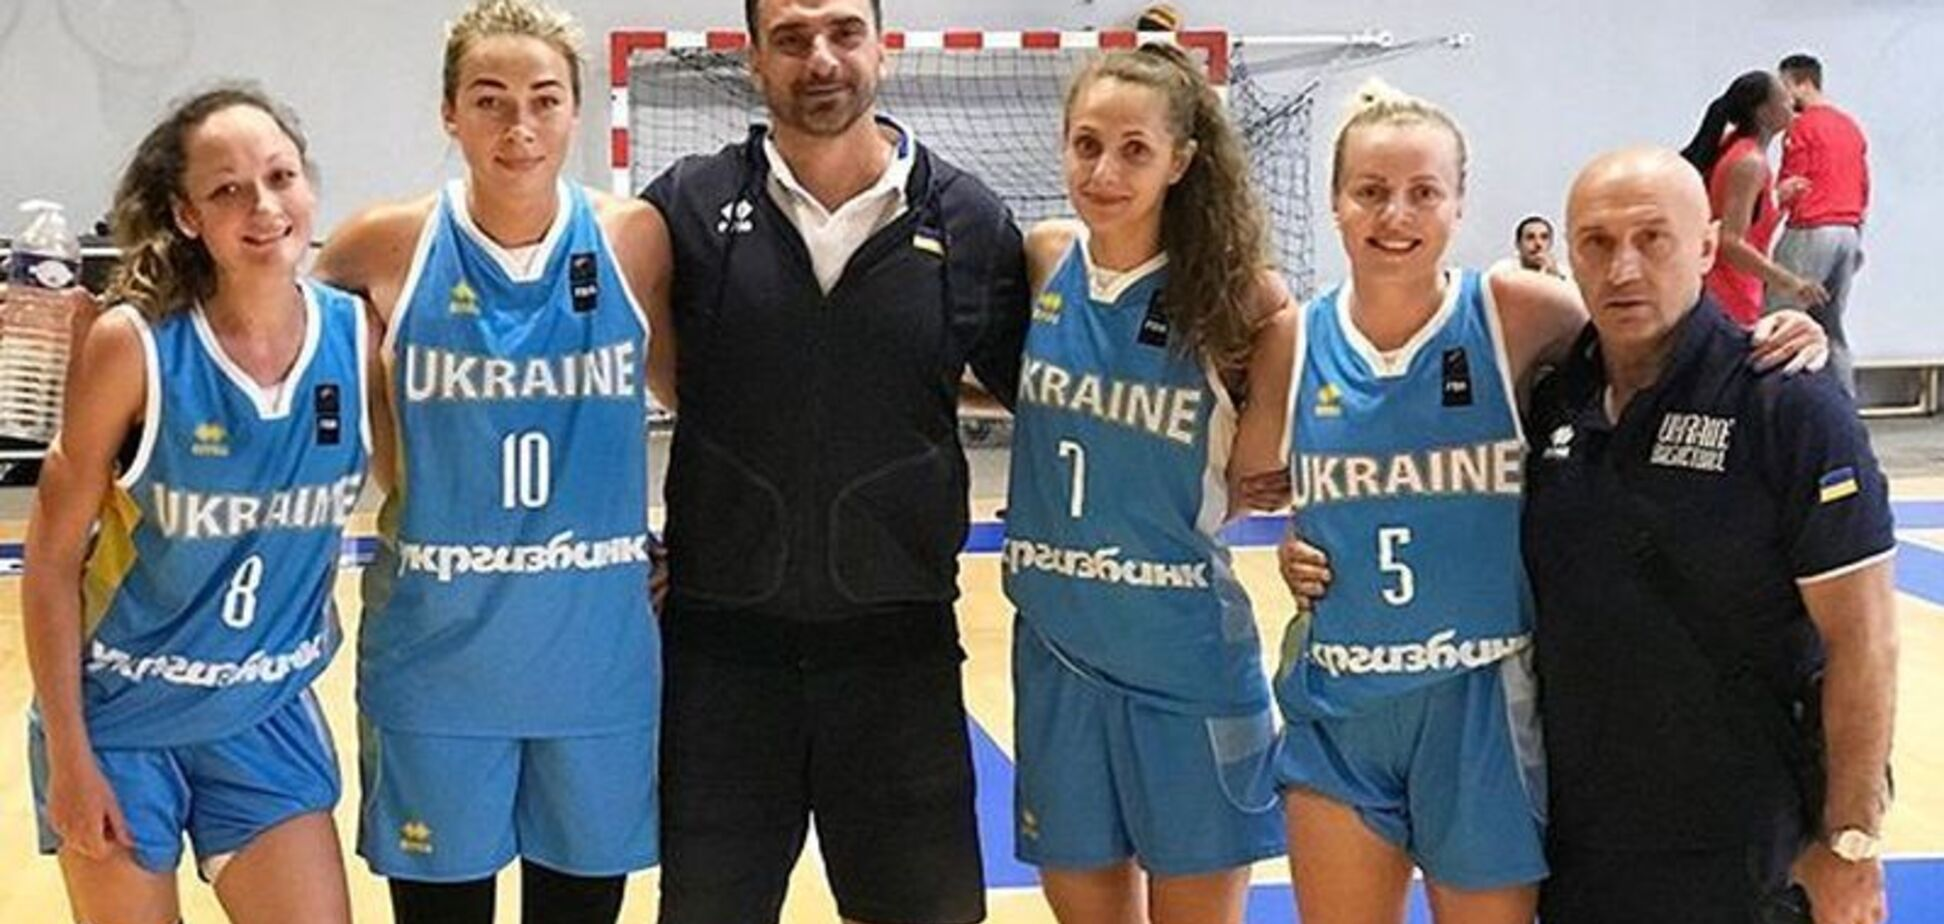 Украина вышла в финал супертурнира по баскетболу 3х3